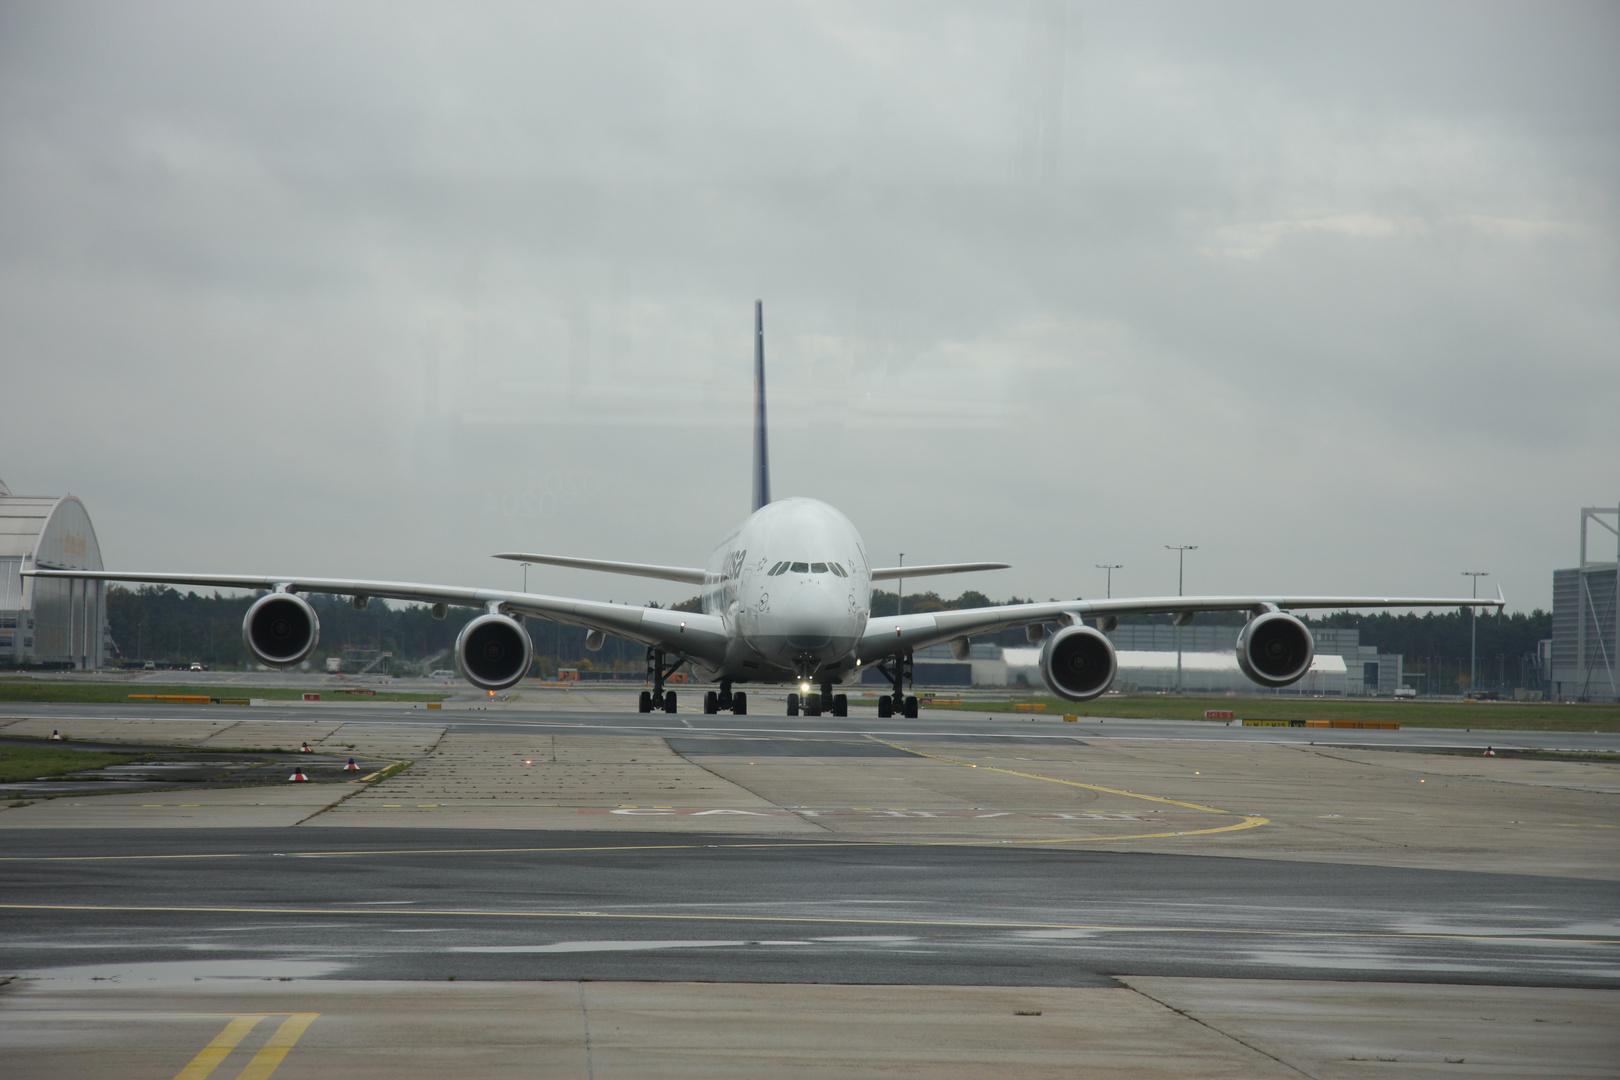 A380.